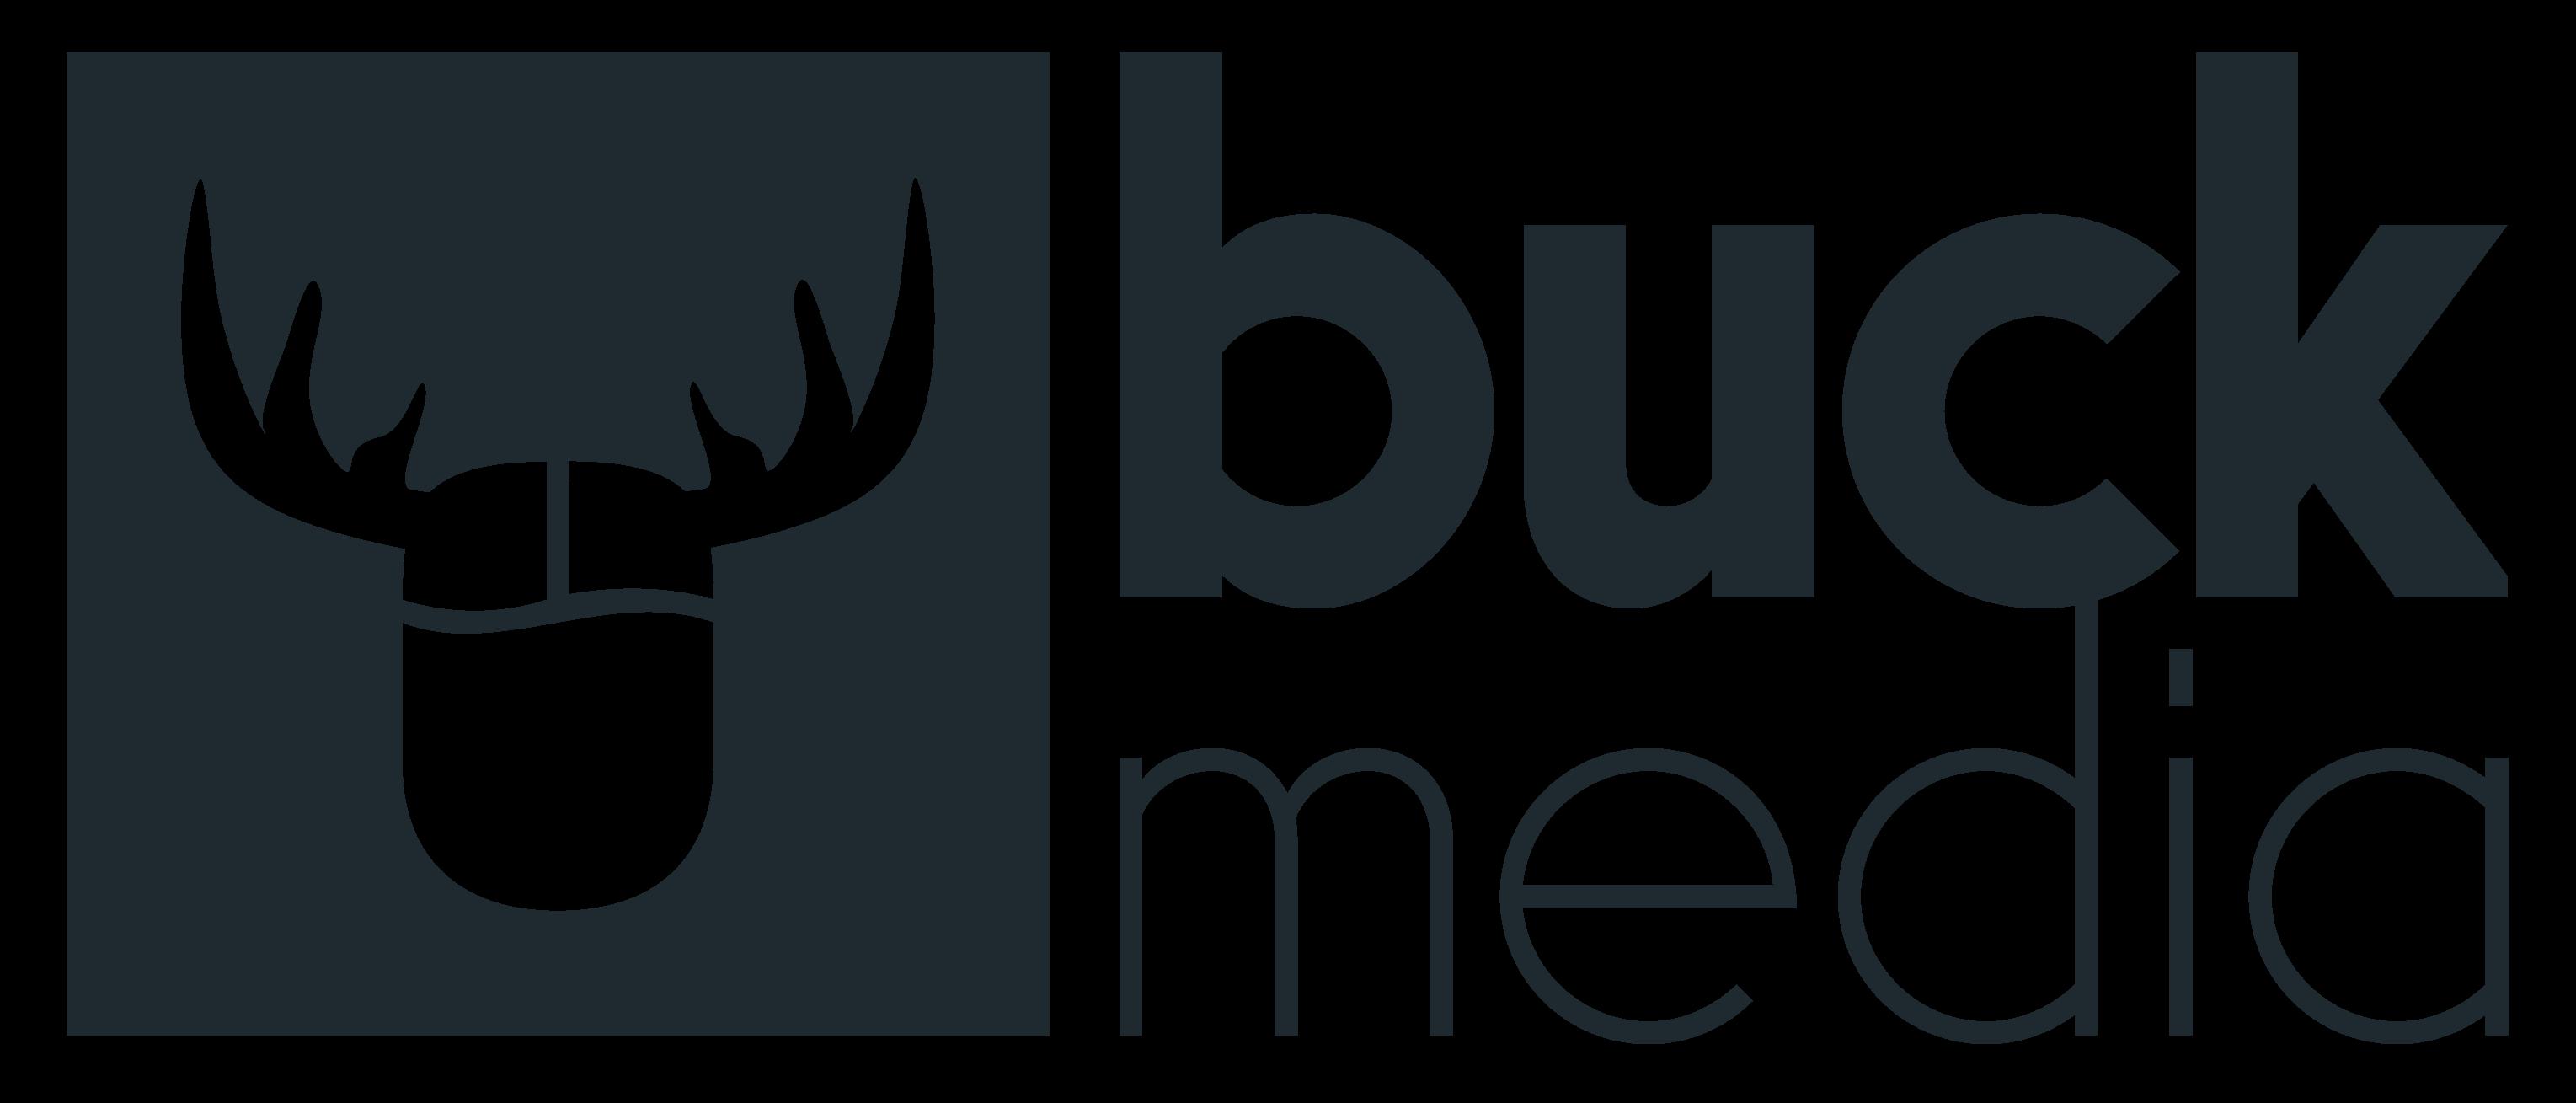 Thomas Buck | buck media